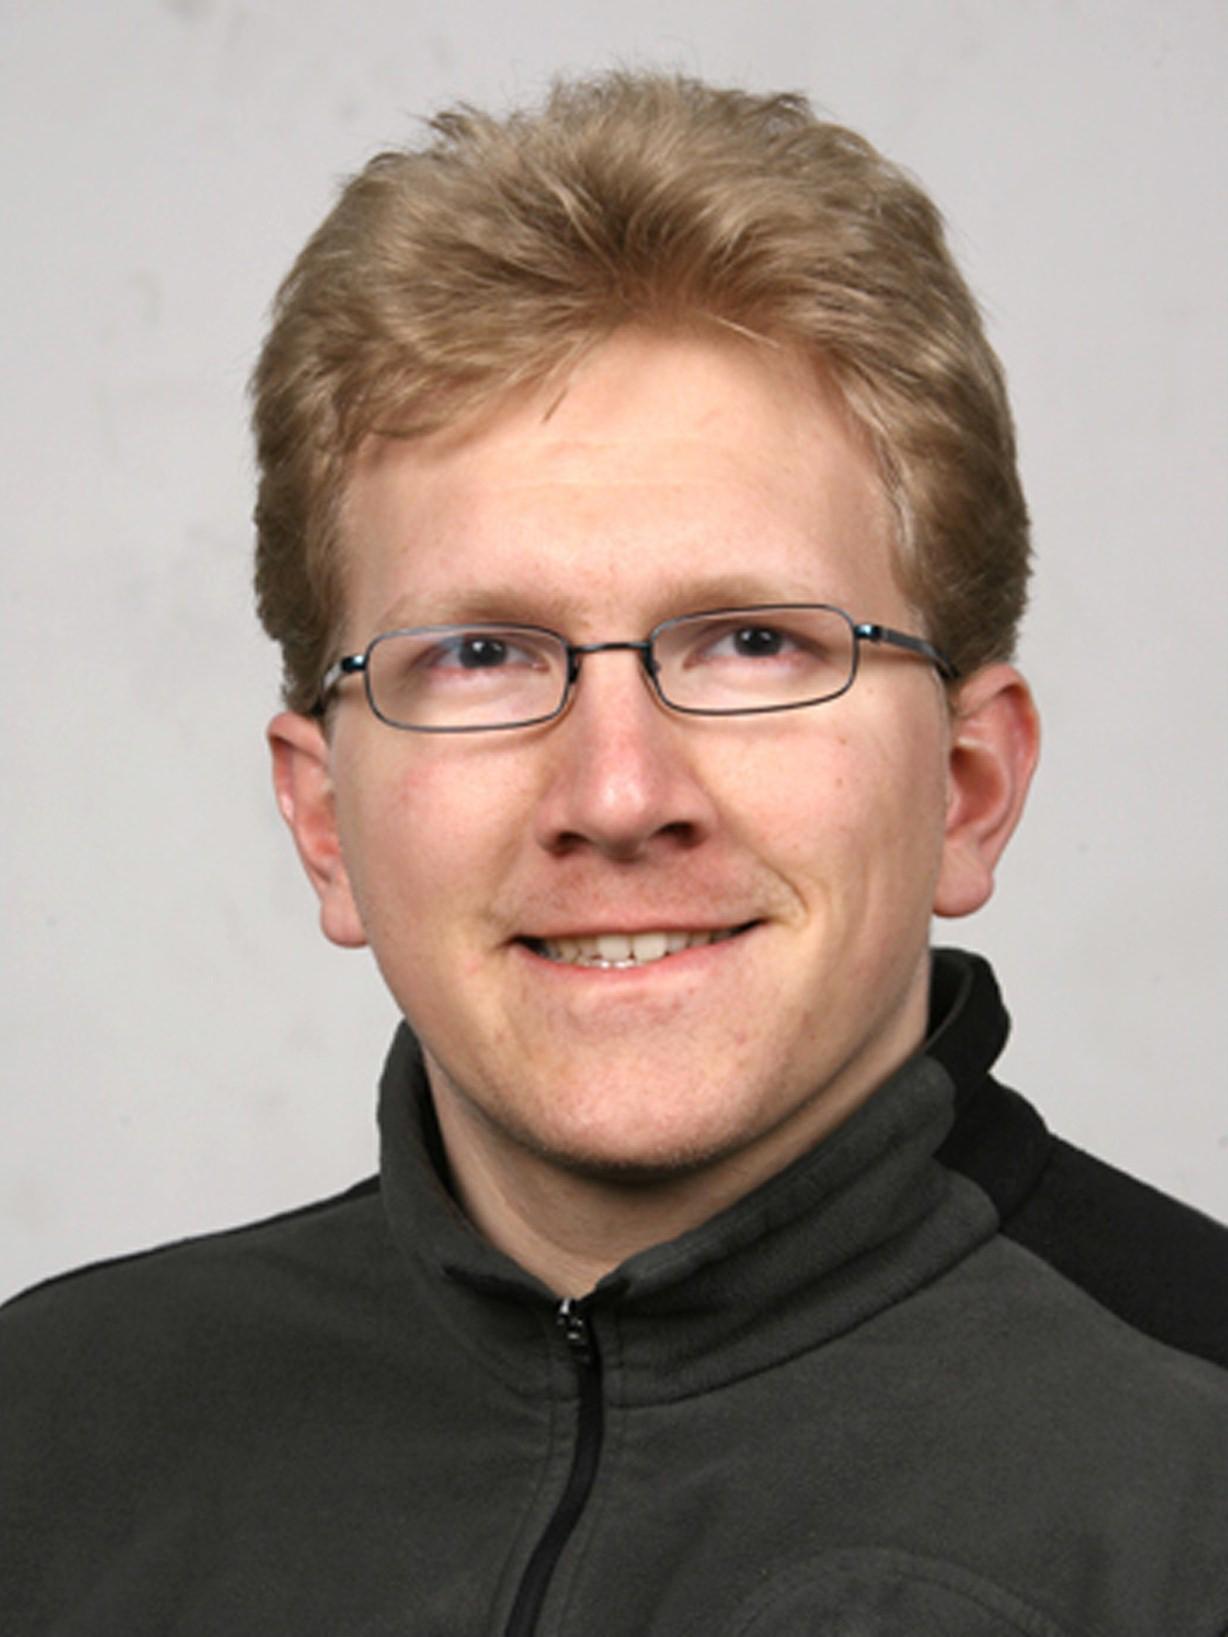 <b>Carsten Grimm</b> - grimm